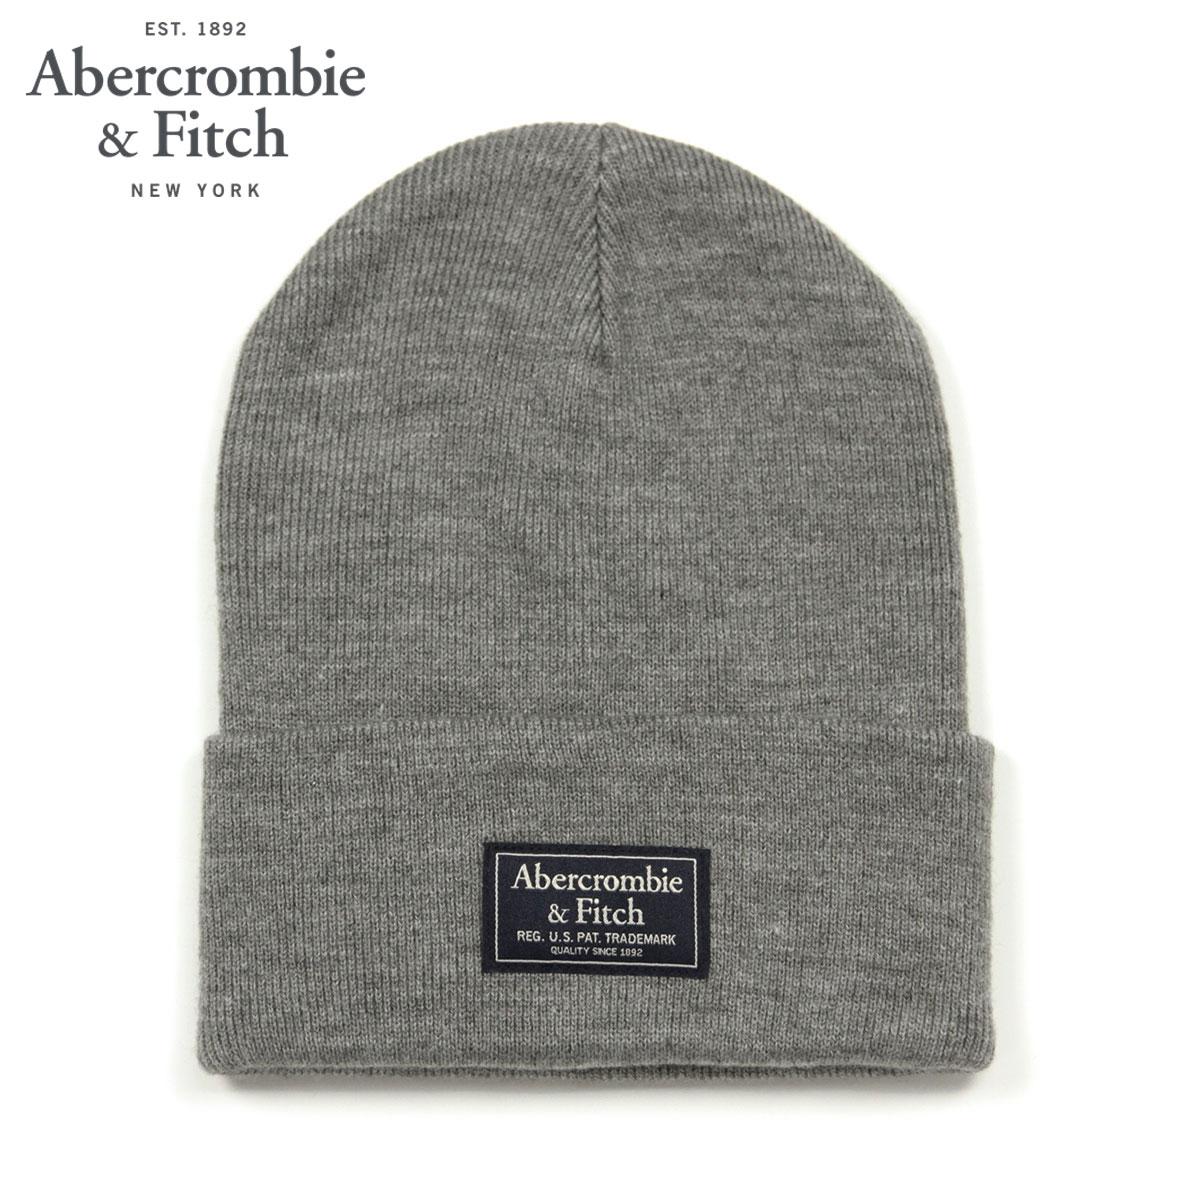 788430f8 ABBA black Abercrombie & Fitch regular article men gap Dis hat beanie  knit hat LOGO ...